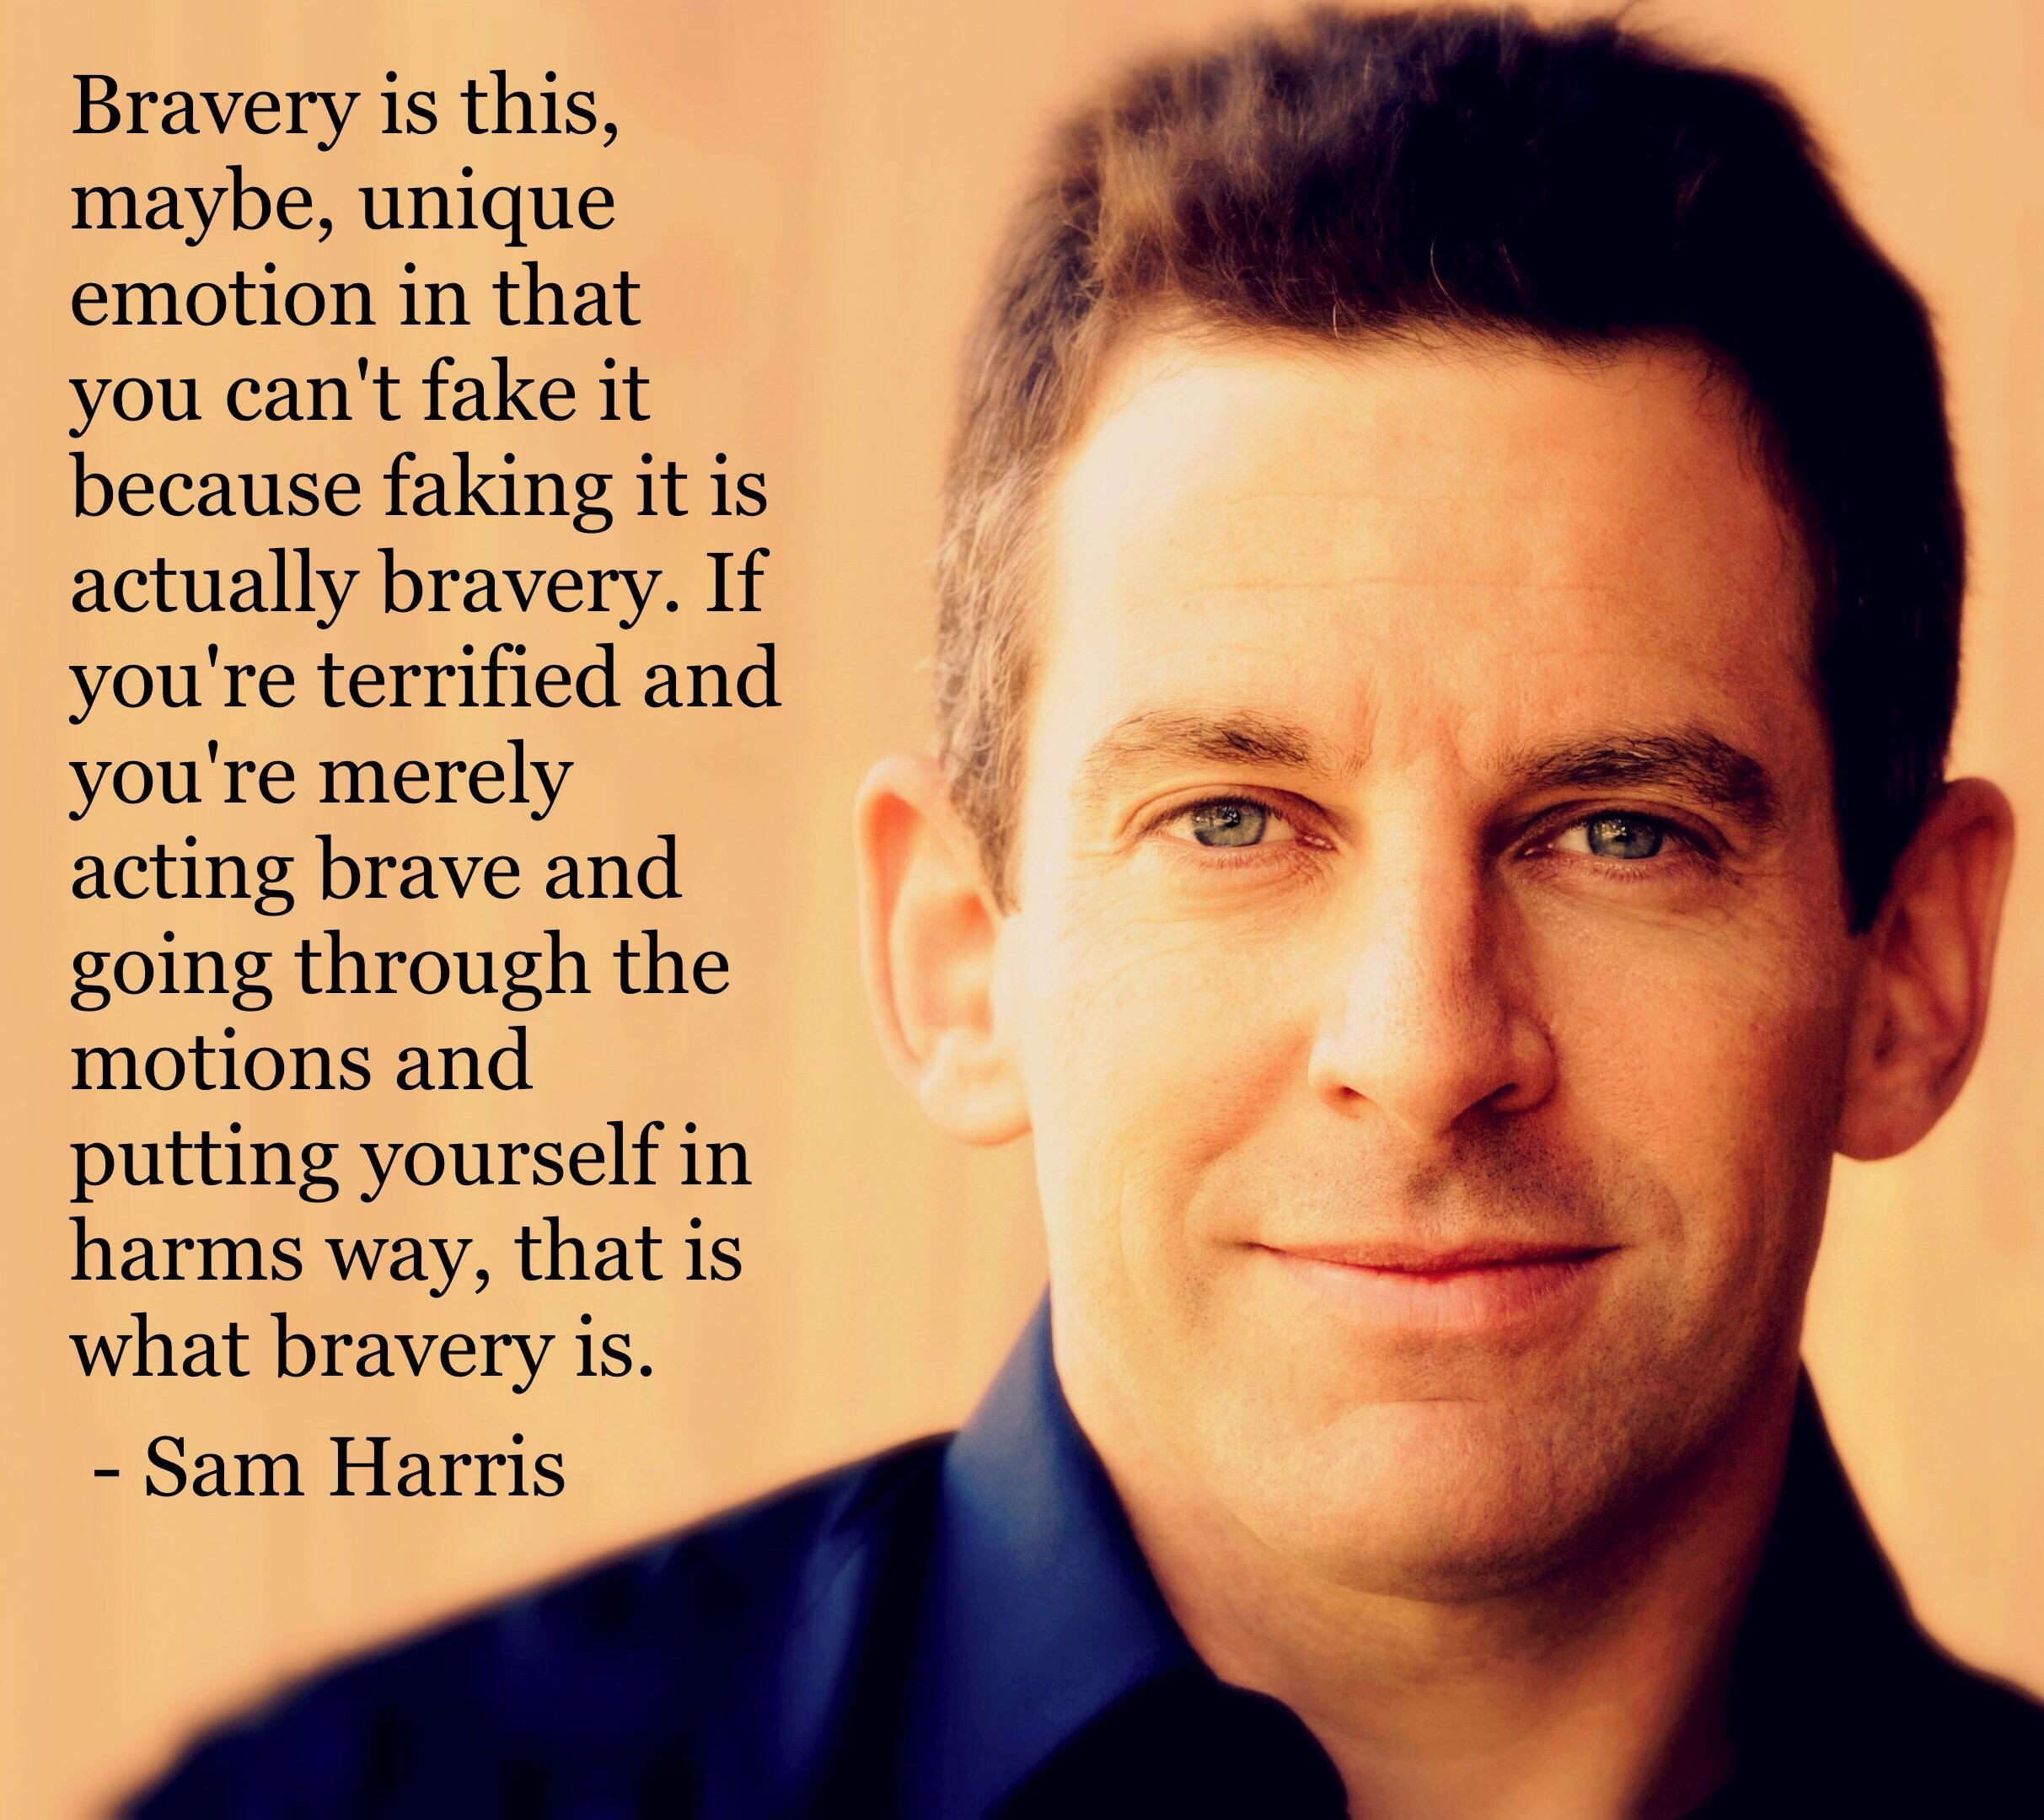 [Image] Sam Harris on Bravery